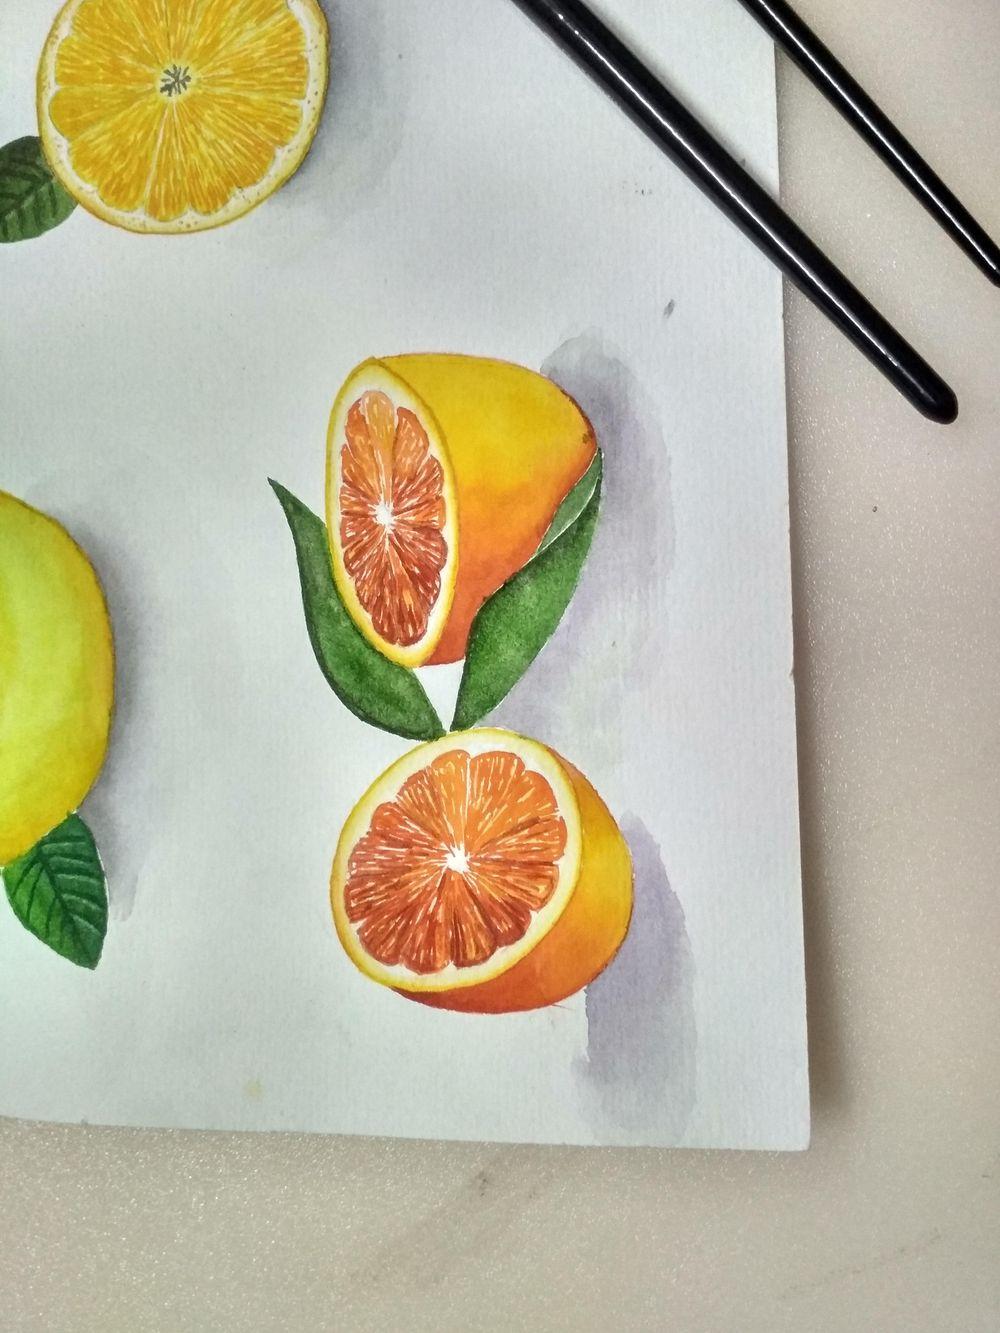 Citrus fruits - image 1 - student project